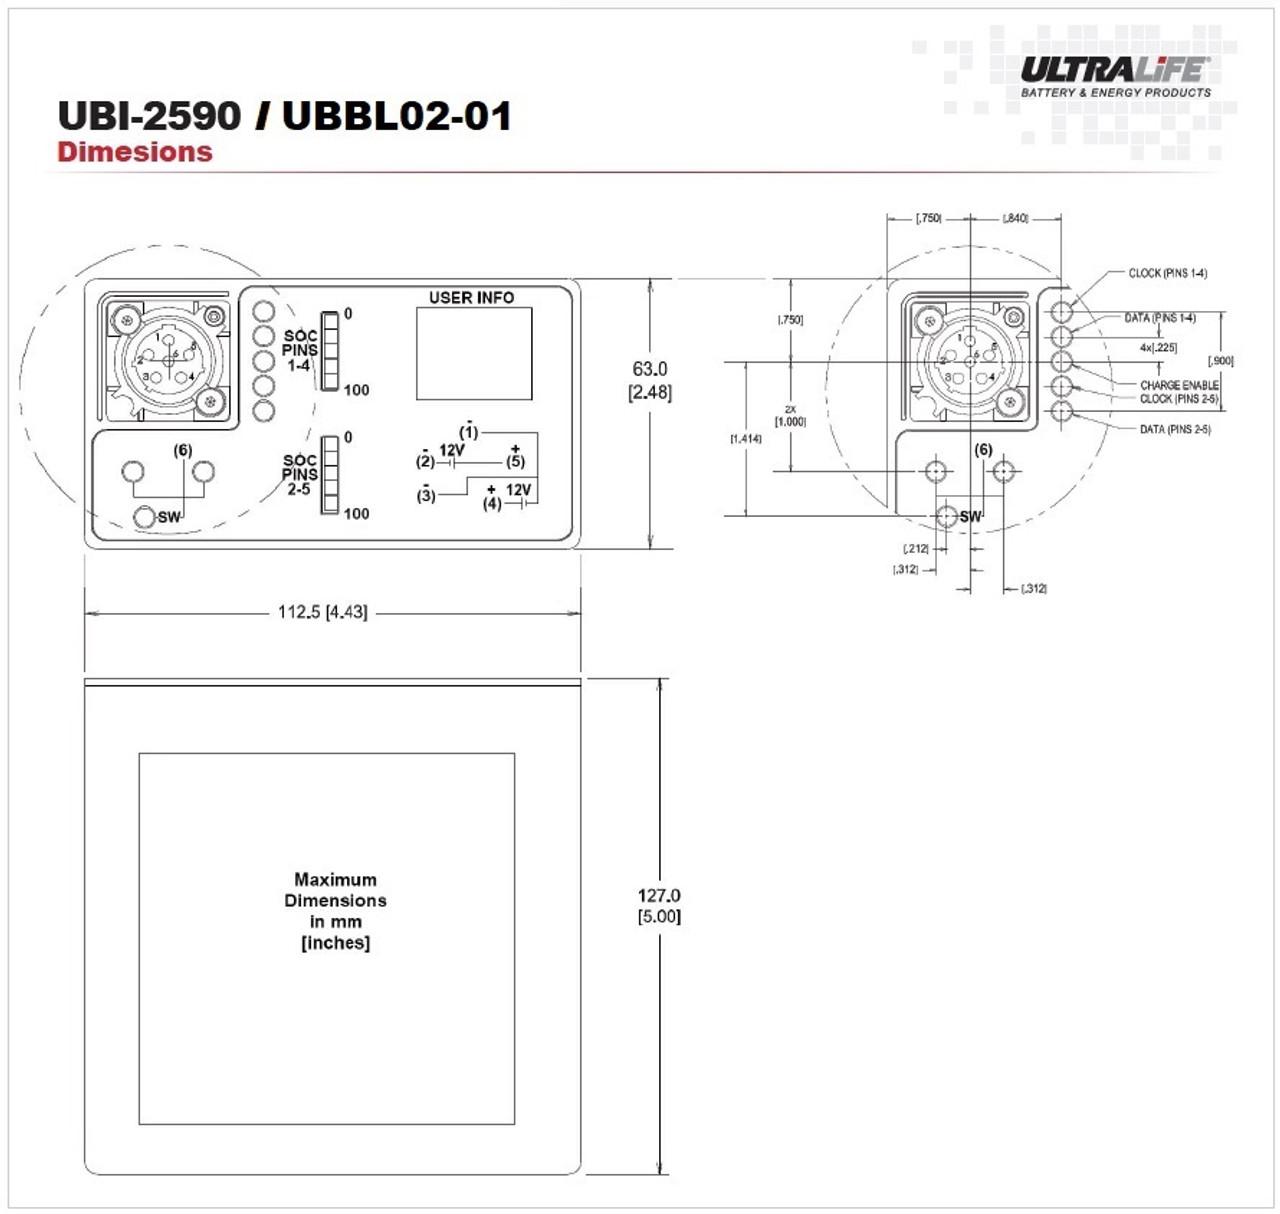 Ultralife UBBL02-01 / UBI-2950 - Dimensions